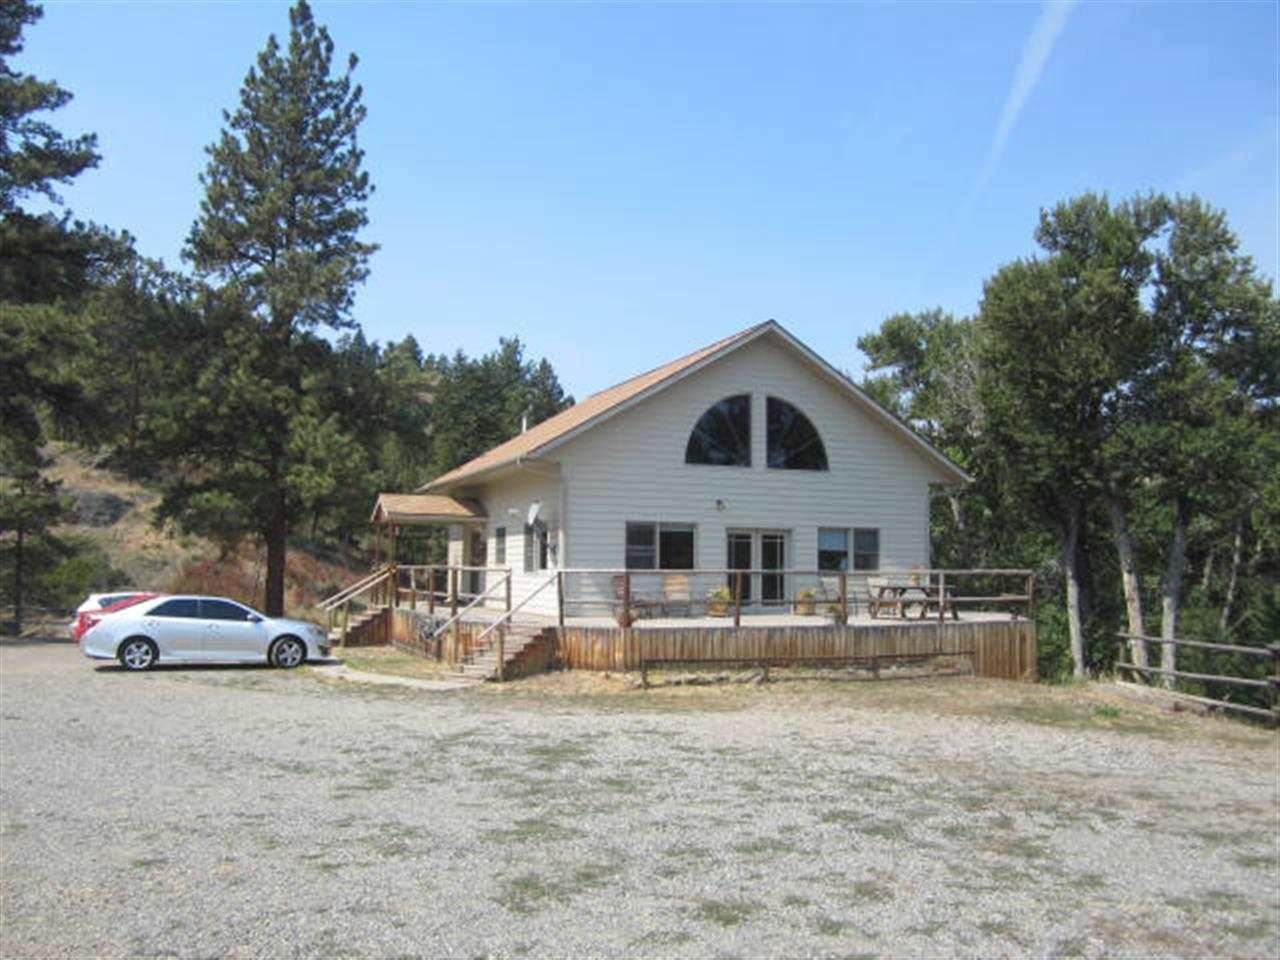 Real Estate for Sale, ListingId: 28227381, Wolf Creek,MT59648